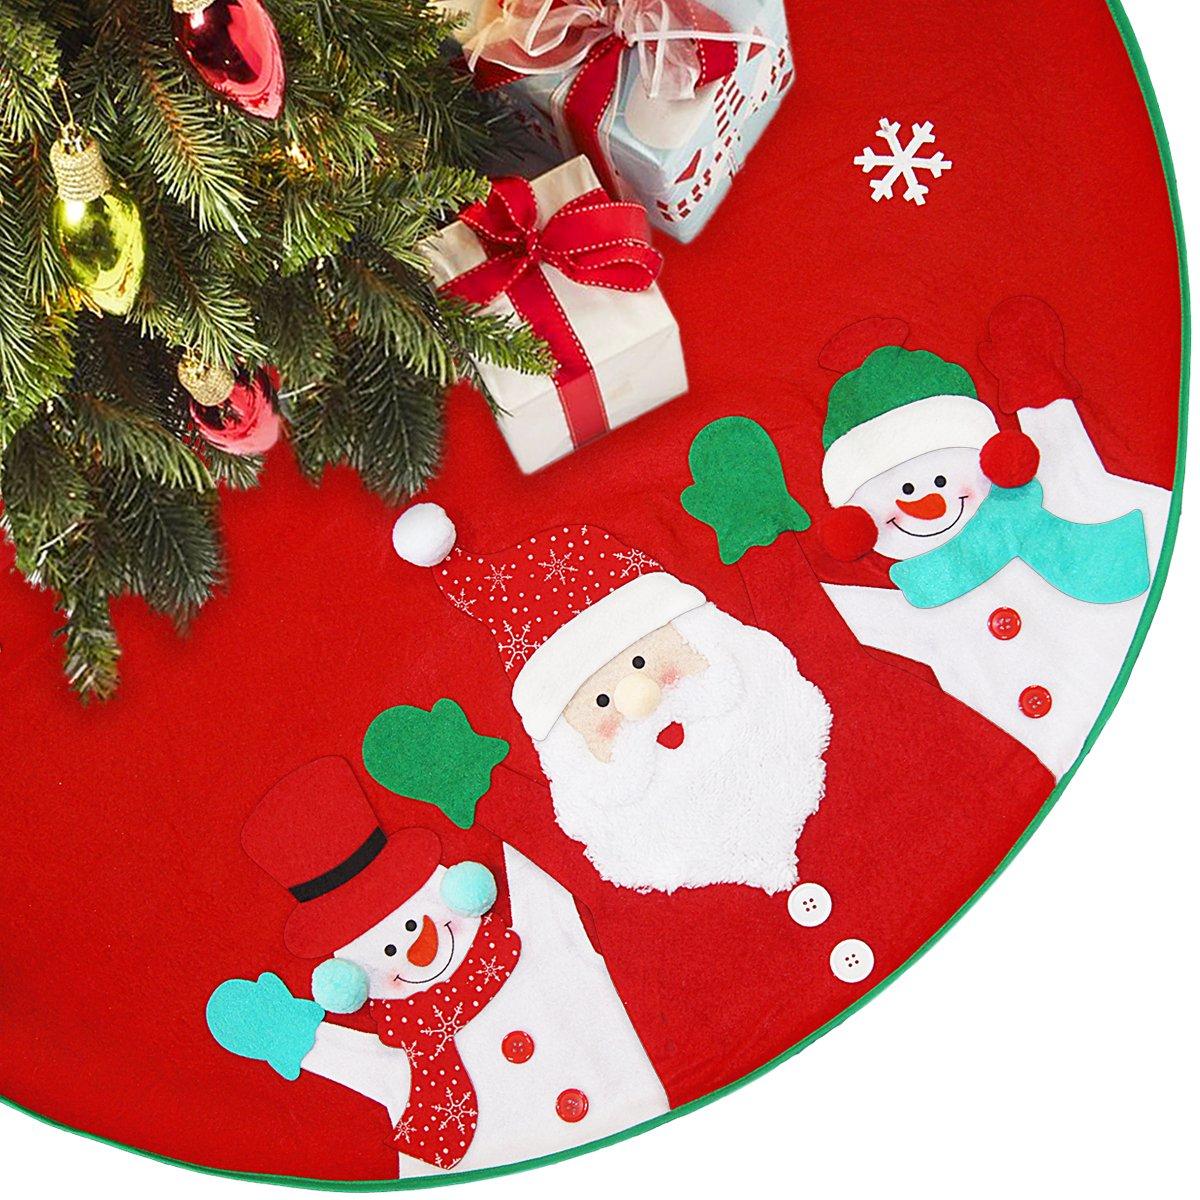 LimBridge 40'' Rustic Red Felt Christmas Tree Skirt with Stitched Santa Claus & Snowman 3D Plush Details Xmas Holiday Decoration